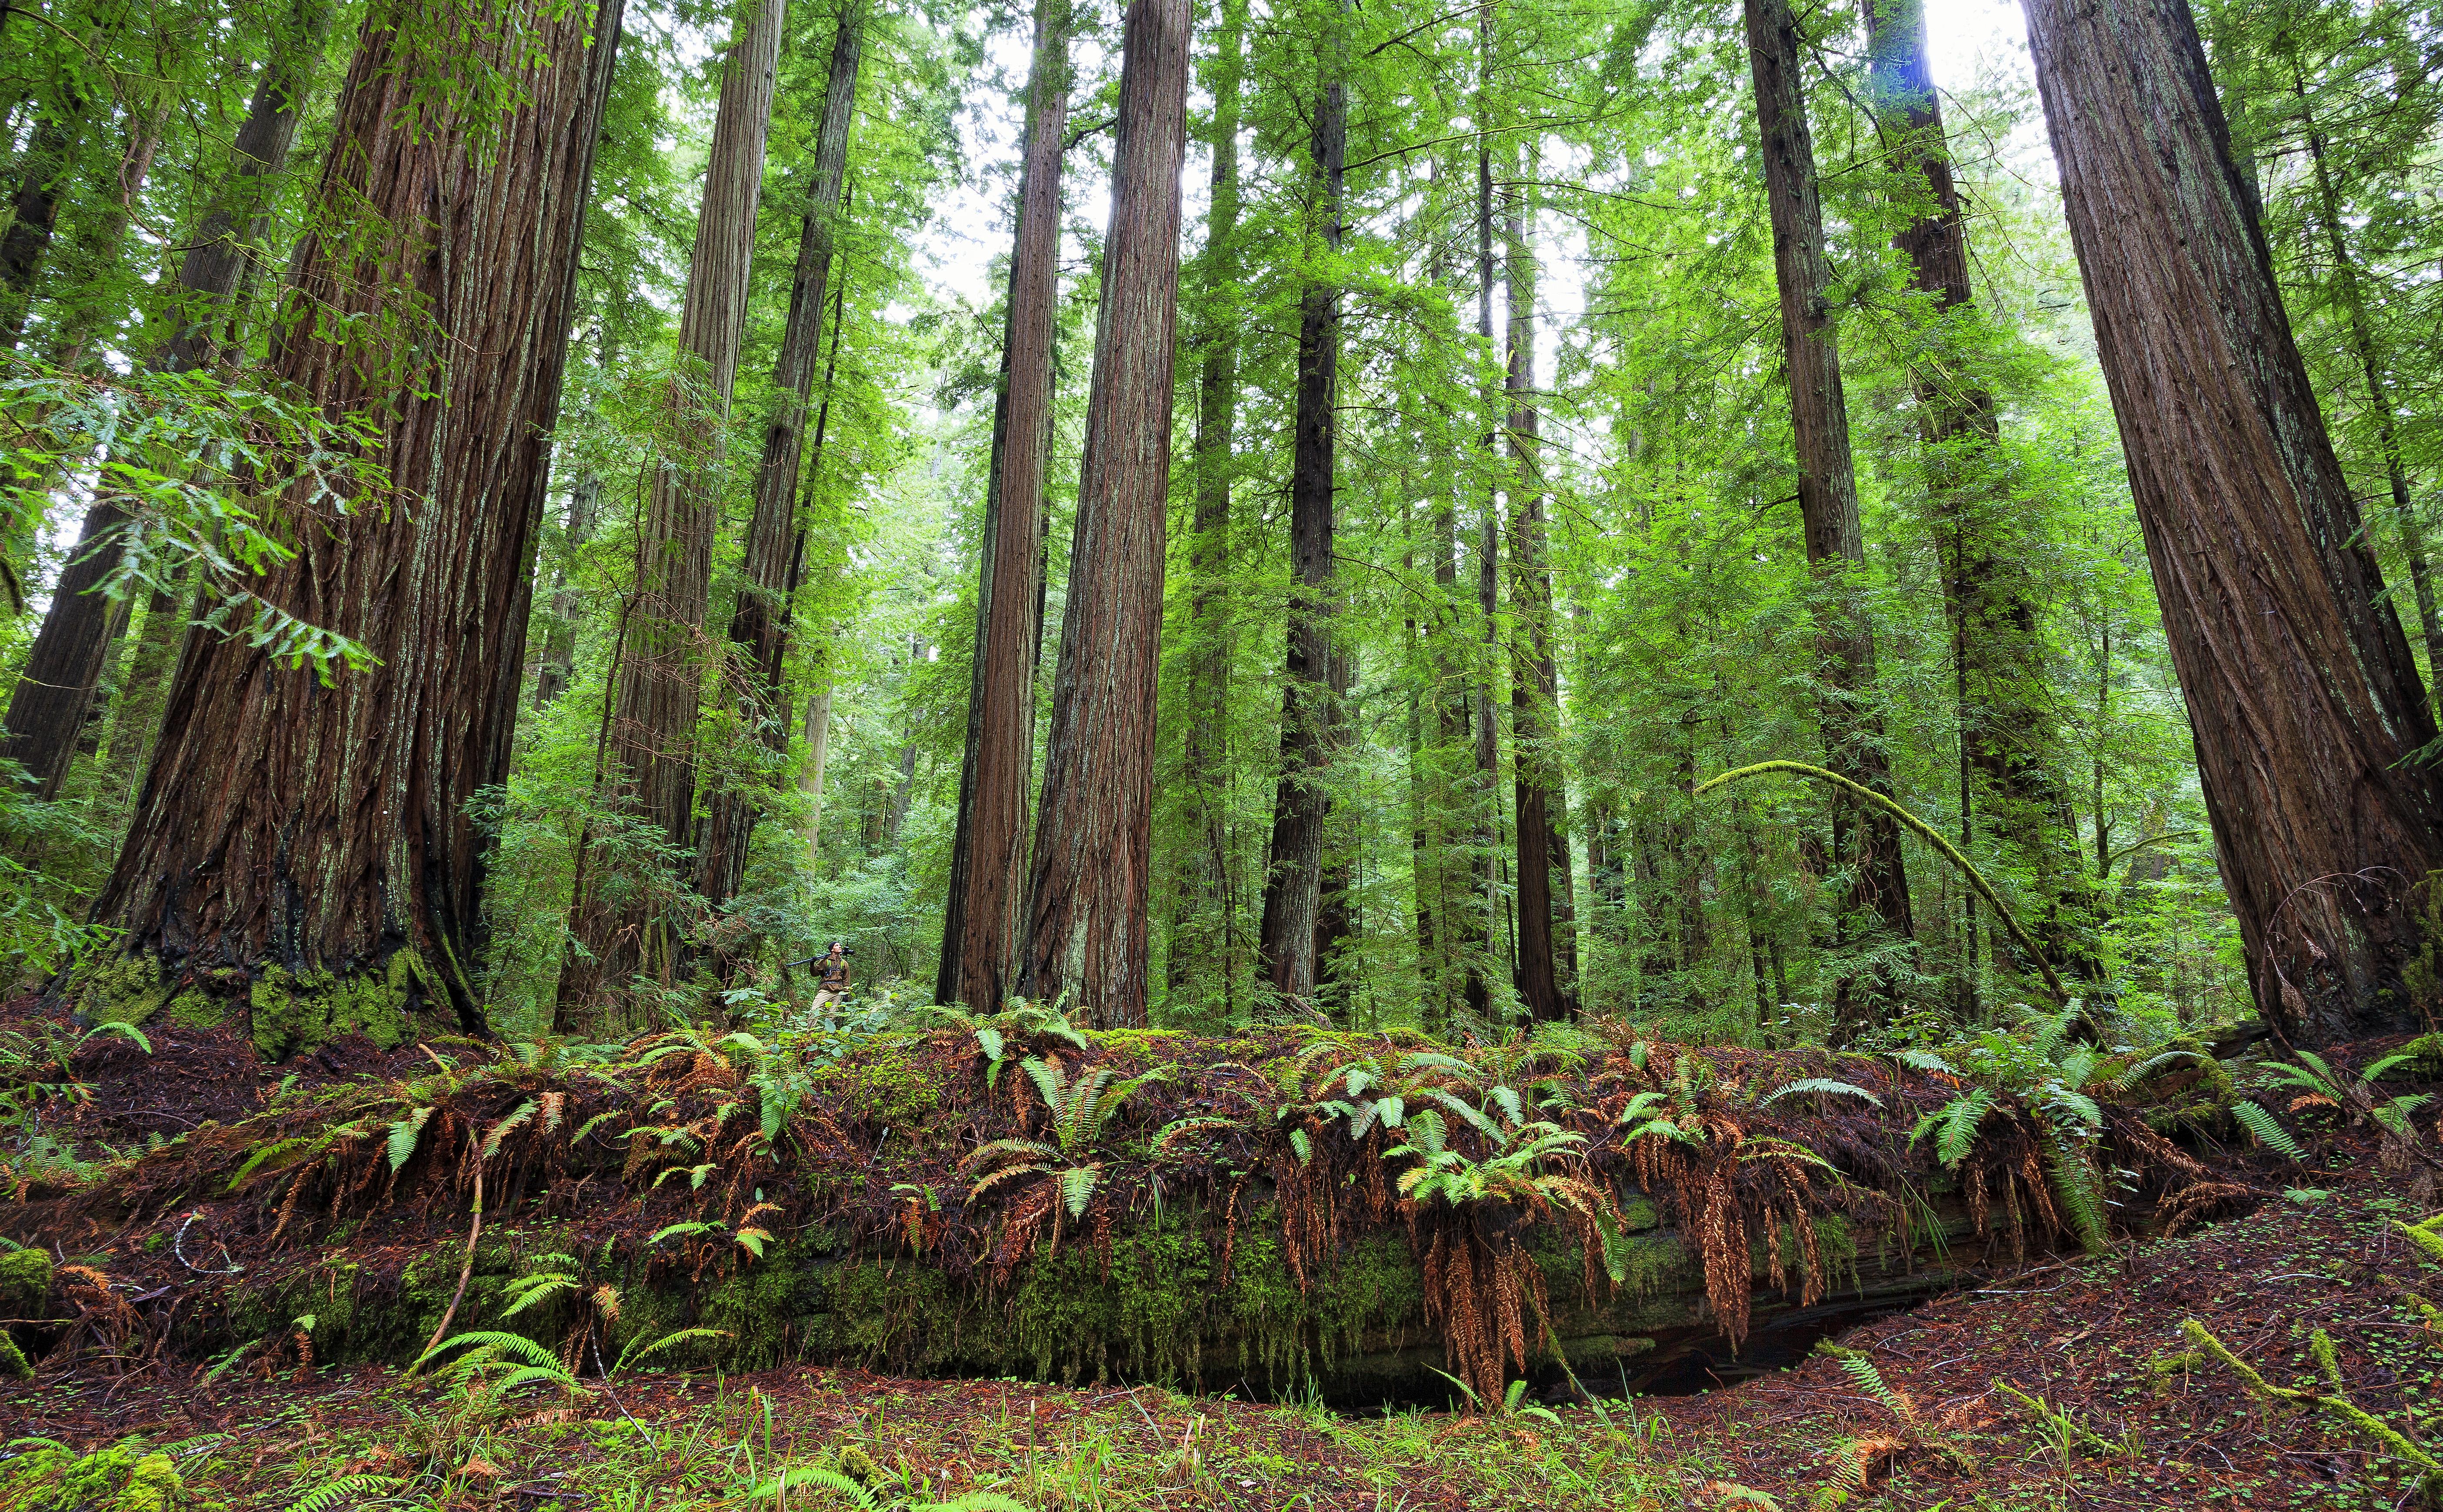 2015 trees please photo contest winners